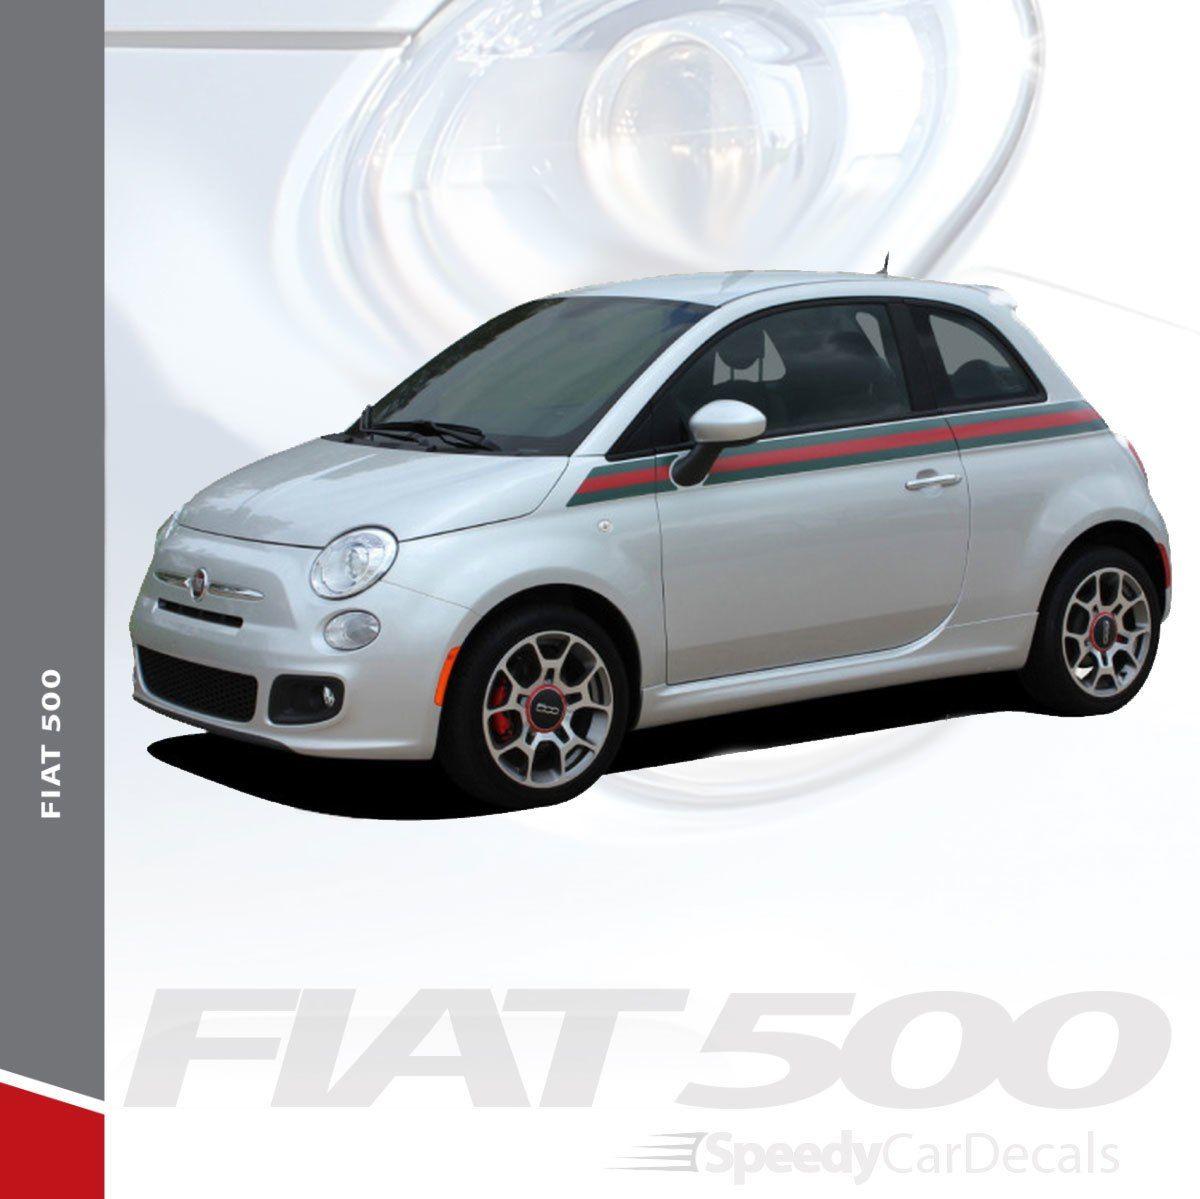 Fiat 500 Gucci Stripe Graphics 2012 2013 2014 2015 2016 2017 2018 2019 Premium Auto Striping Fiat 500 Vinyl Graphics Stripe Kit [ 1199 x 1200 Pixel ]